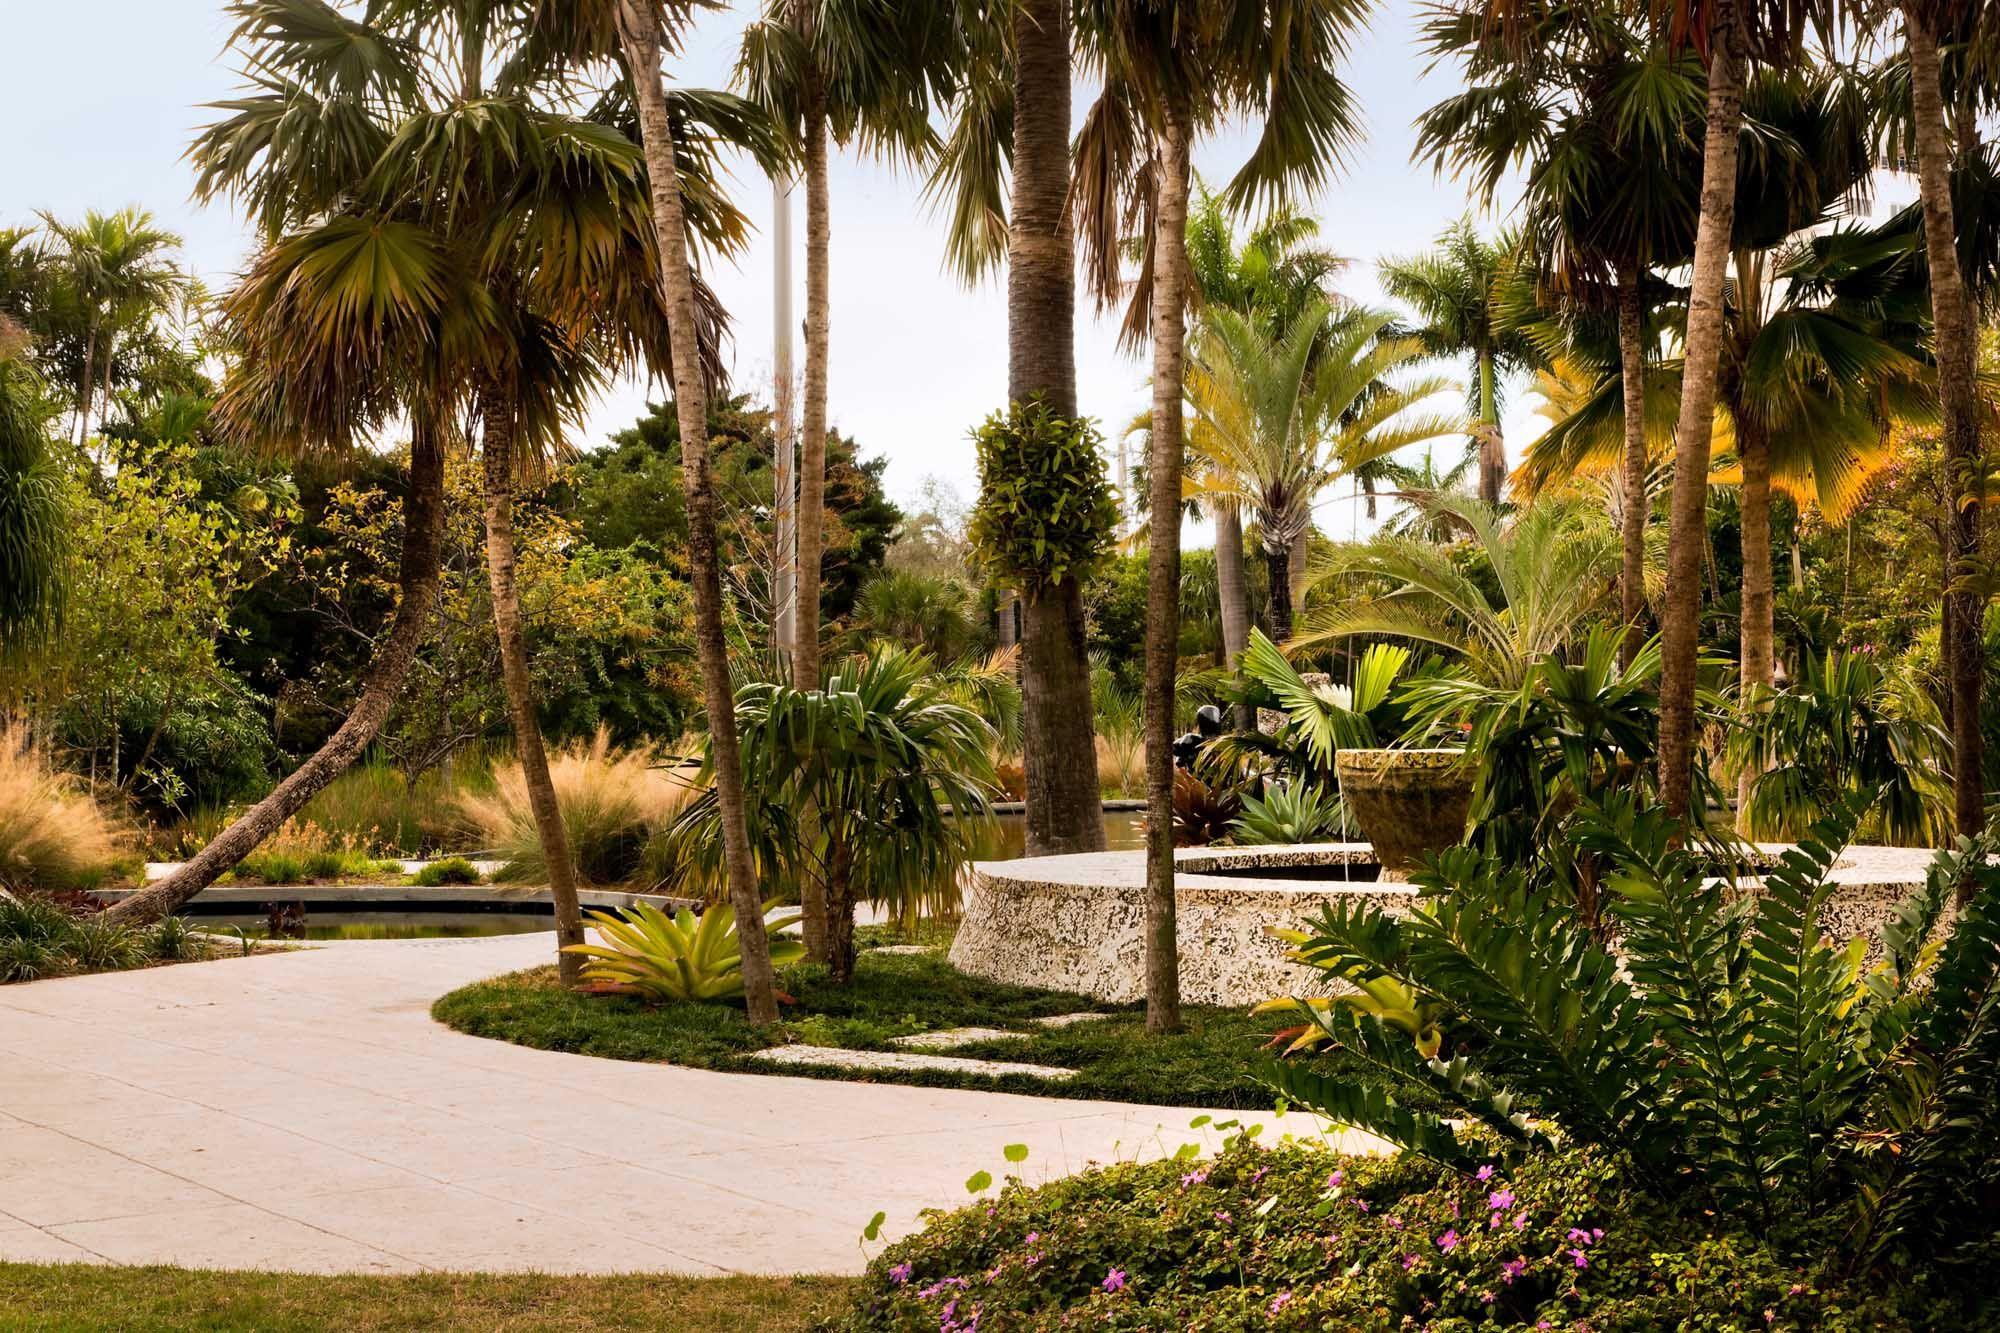 03-MBBG-Steven Brooke Photography   Landscape design   Pinterest ...